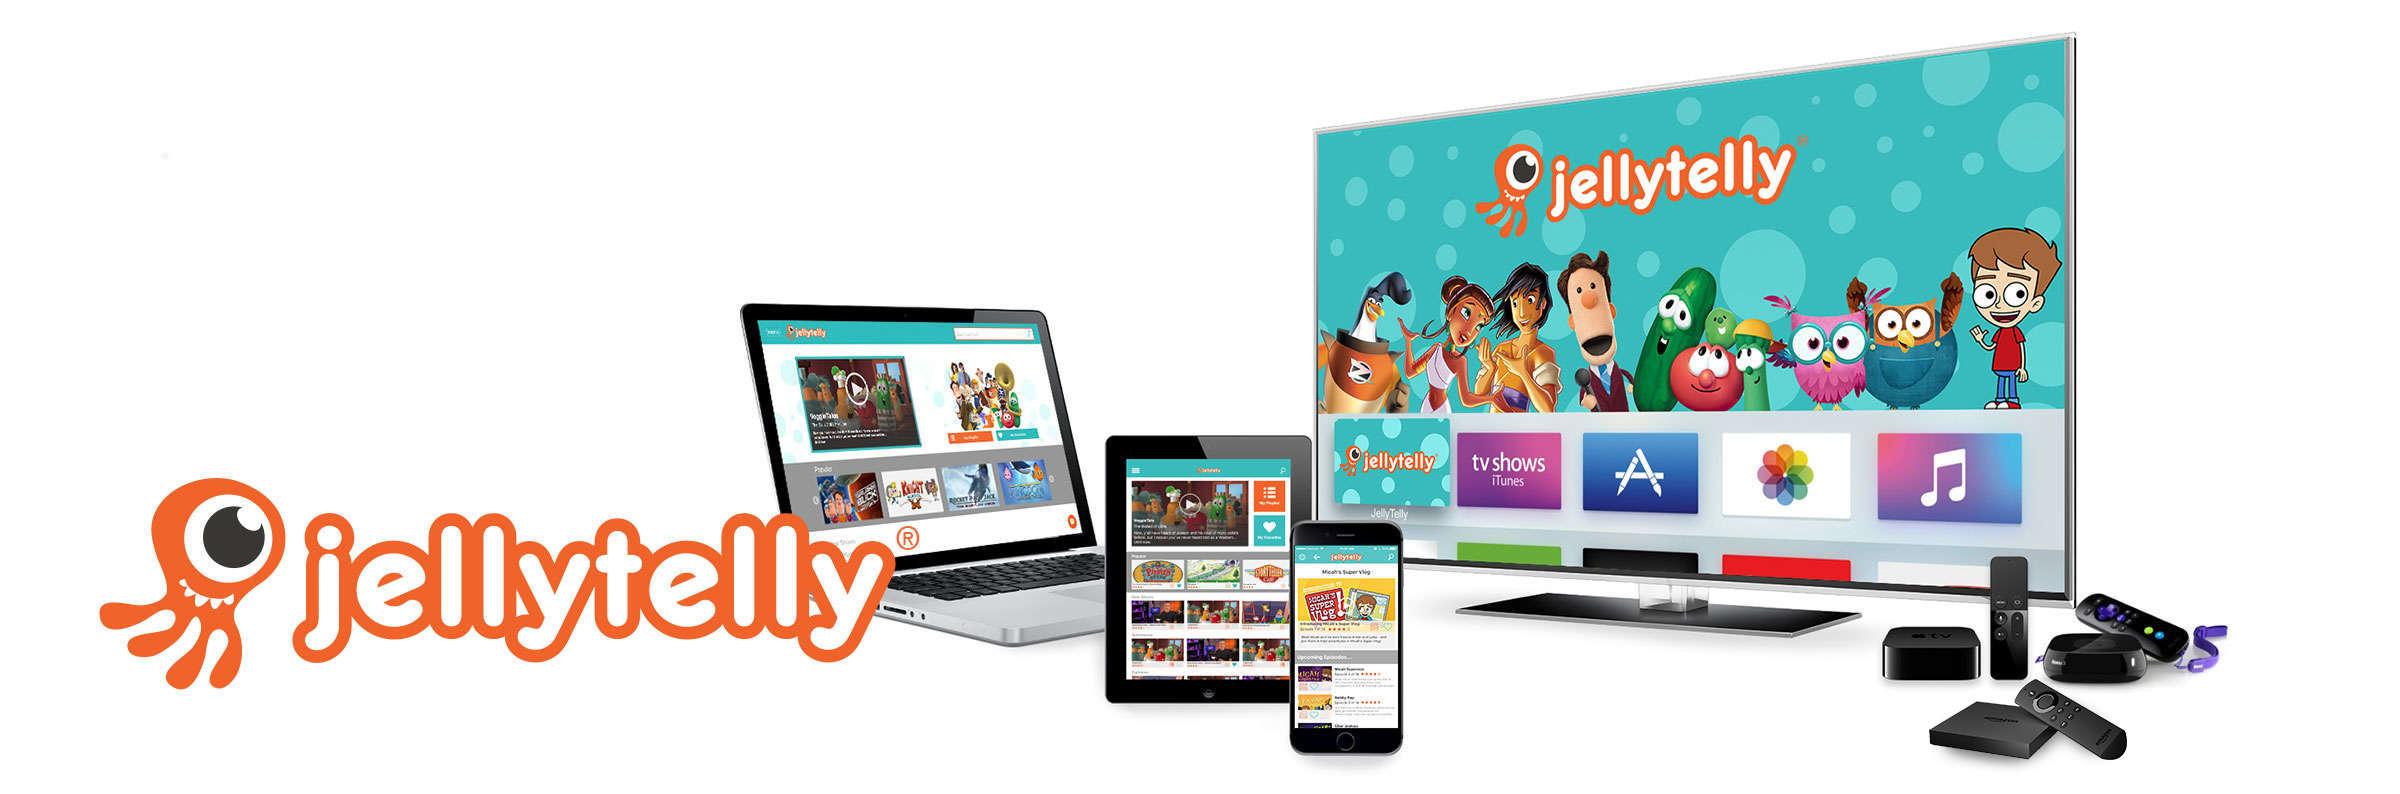 Apps hero 2017 appletv